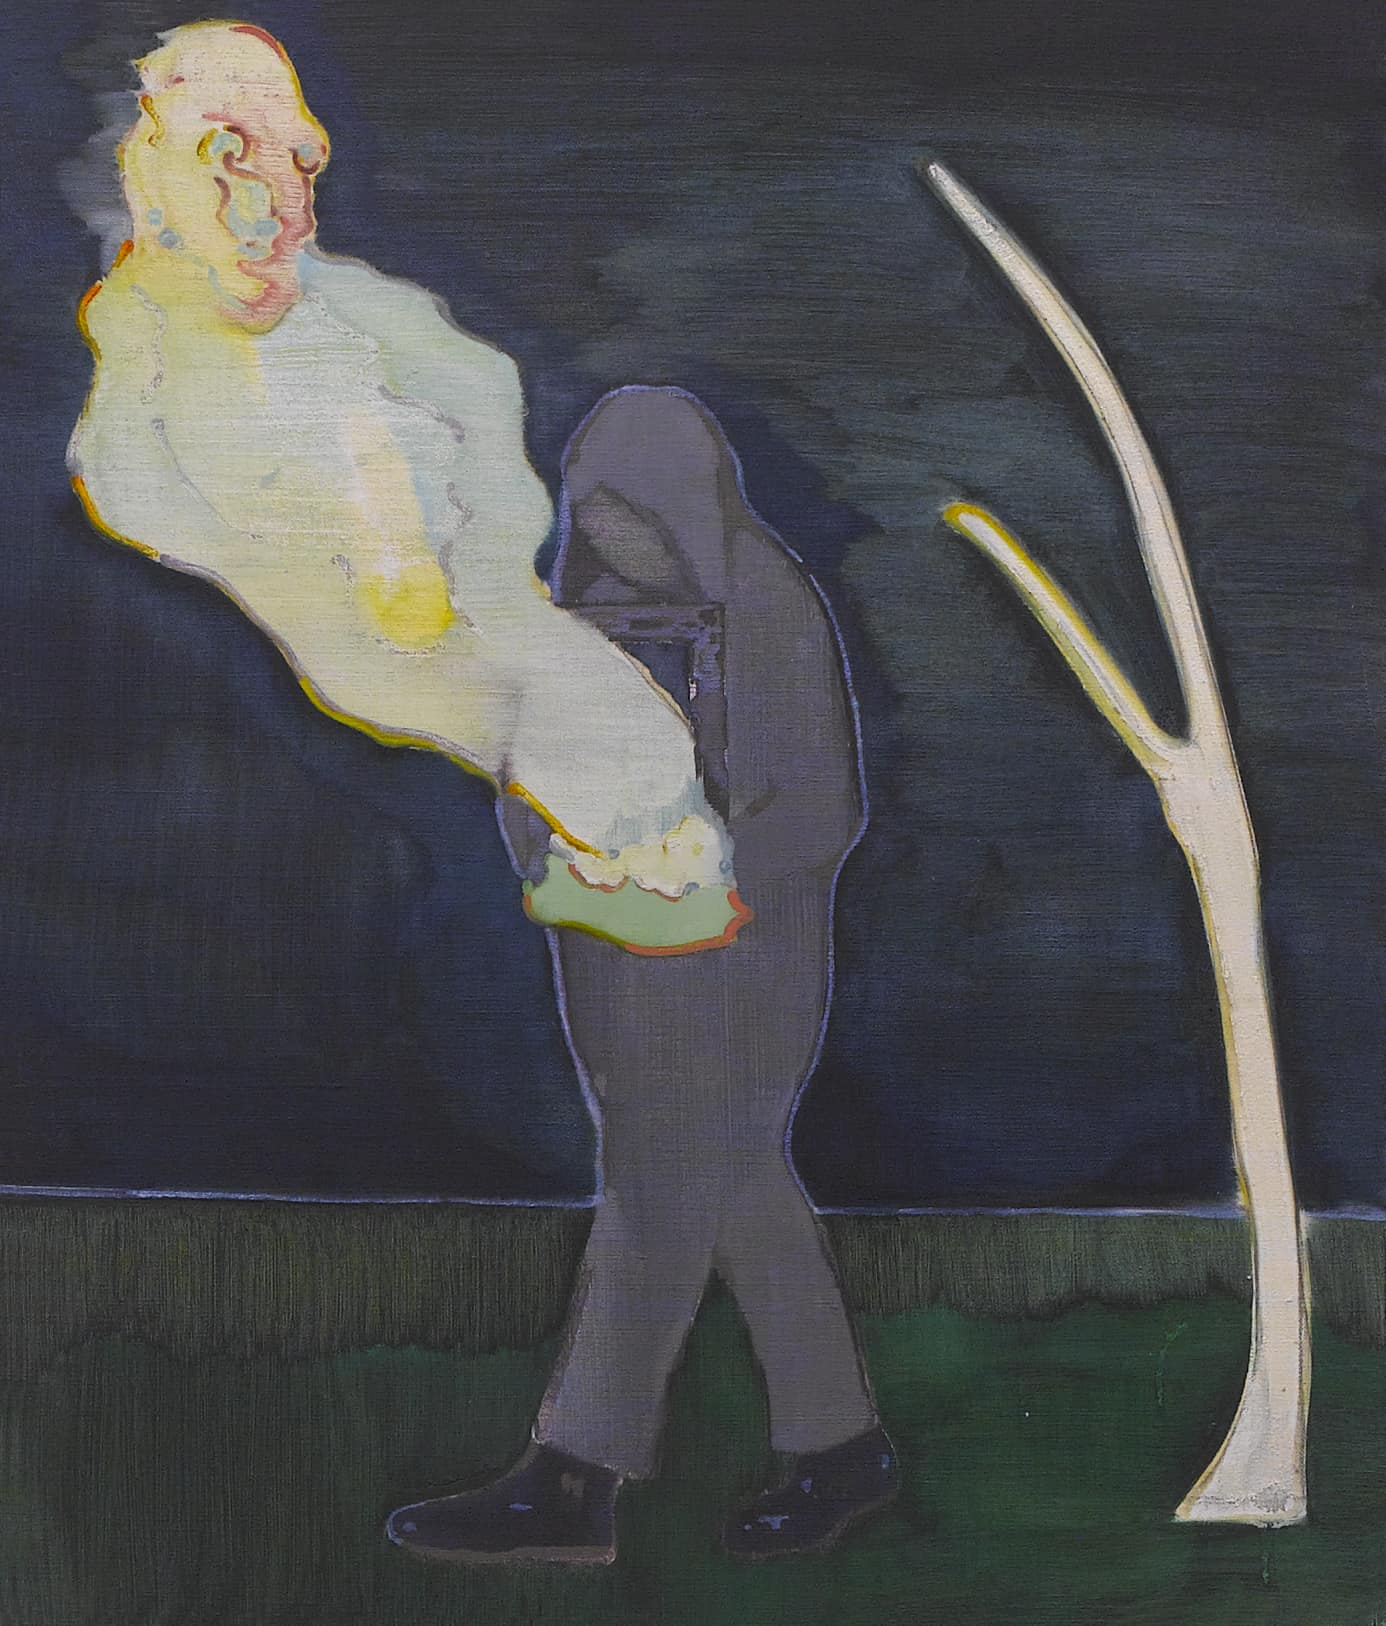 汪一 Wang Yi | 出殡者 A Person in the funeral 布面油画 Oil on canvas | 60 x 70 cm | 2018.jpg